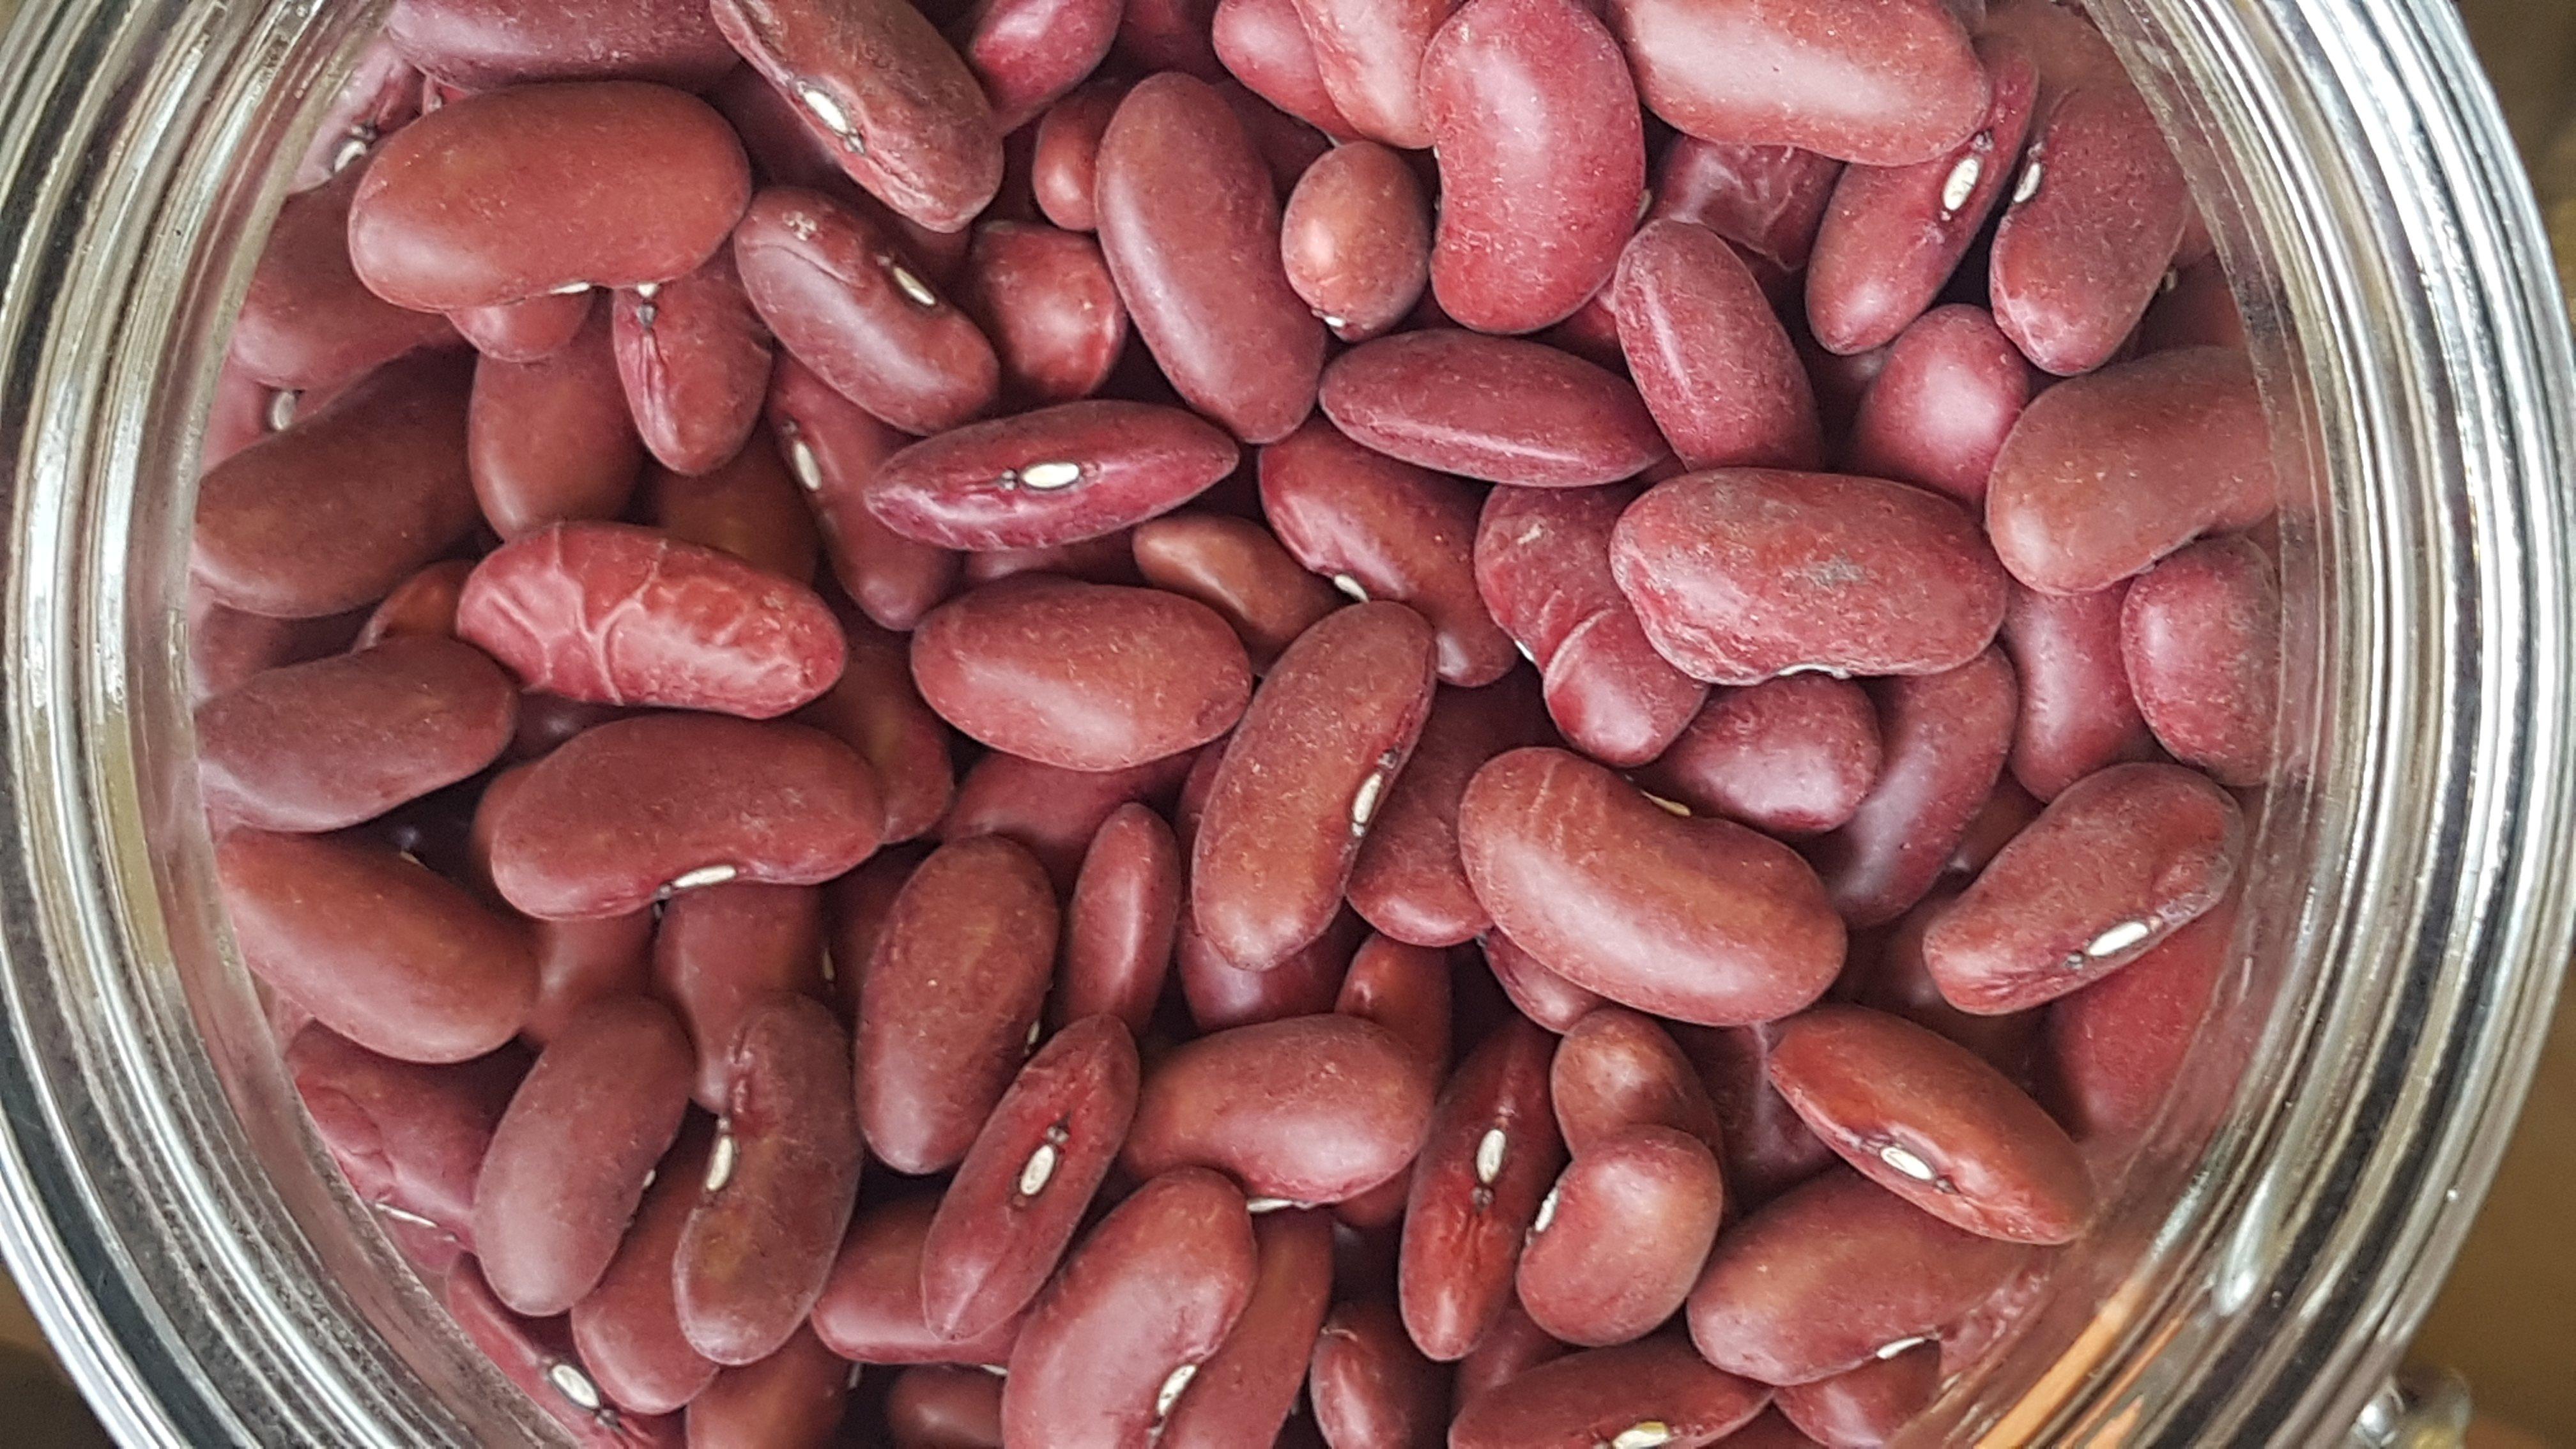 Red Kidney Beans Organic - per 100g